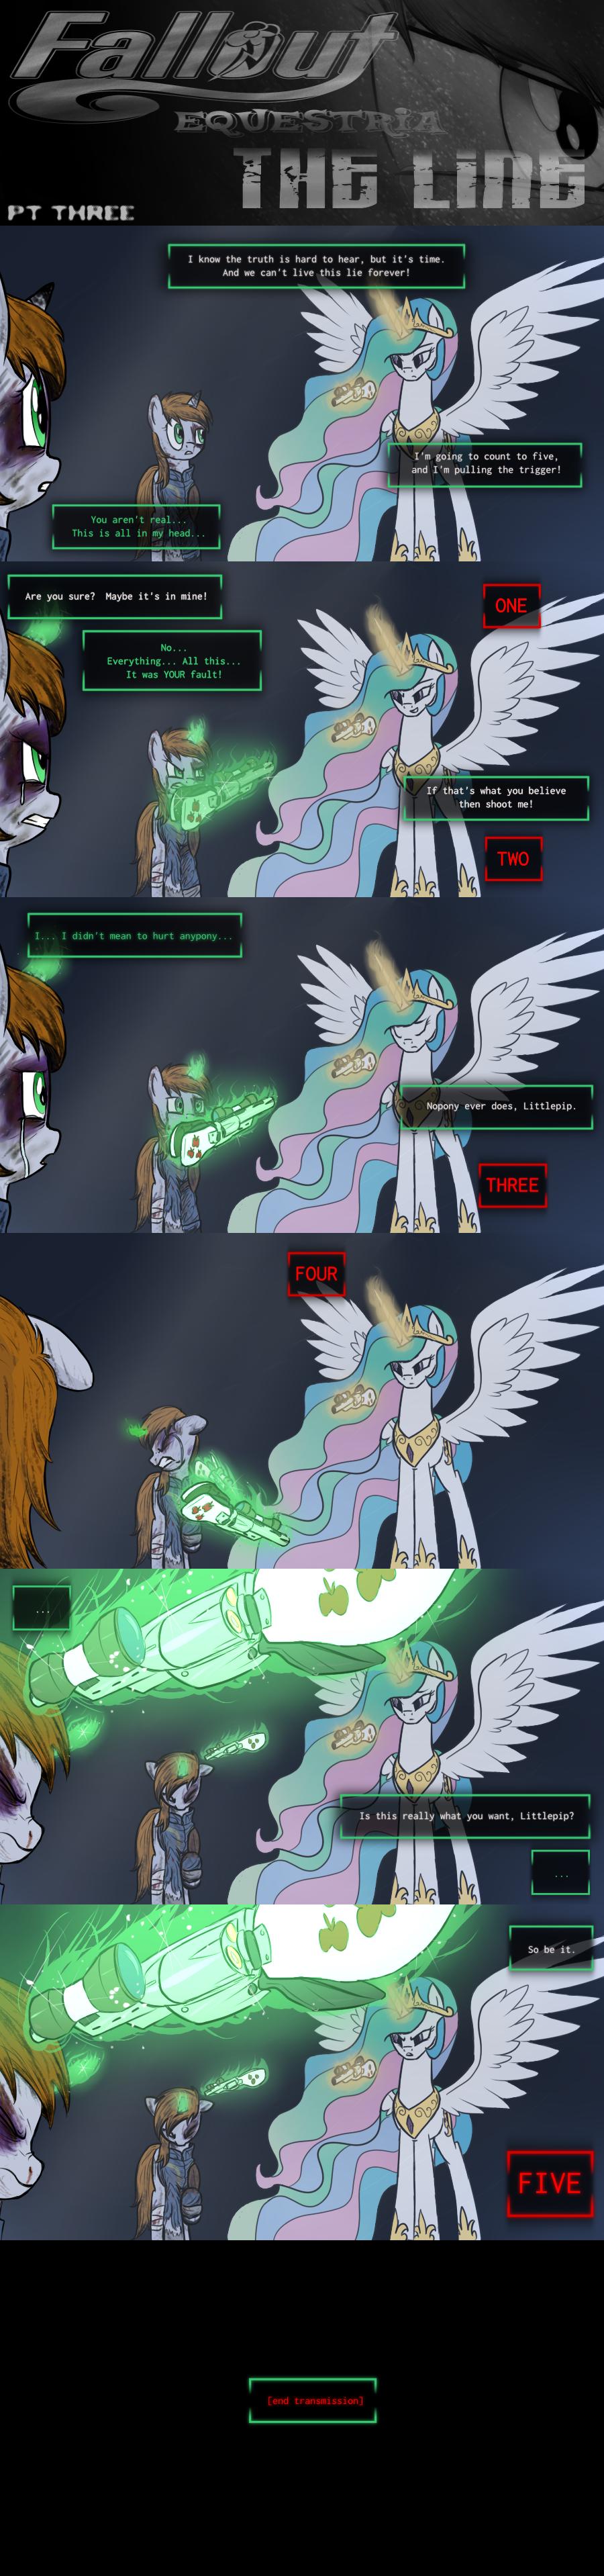 COMMISSION - Fallout Equestria: The Line (Pt 3)